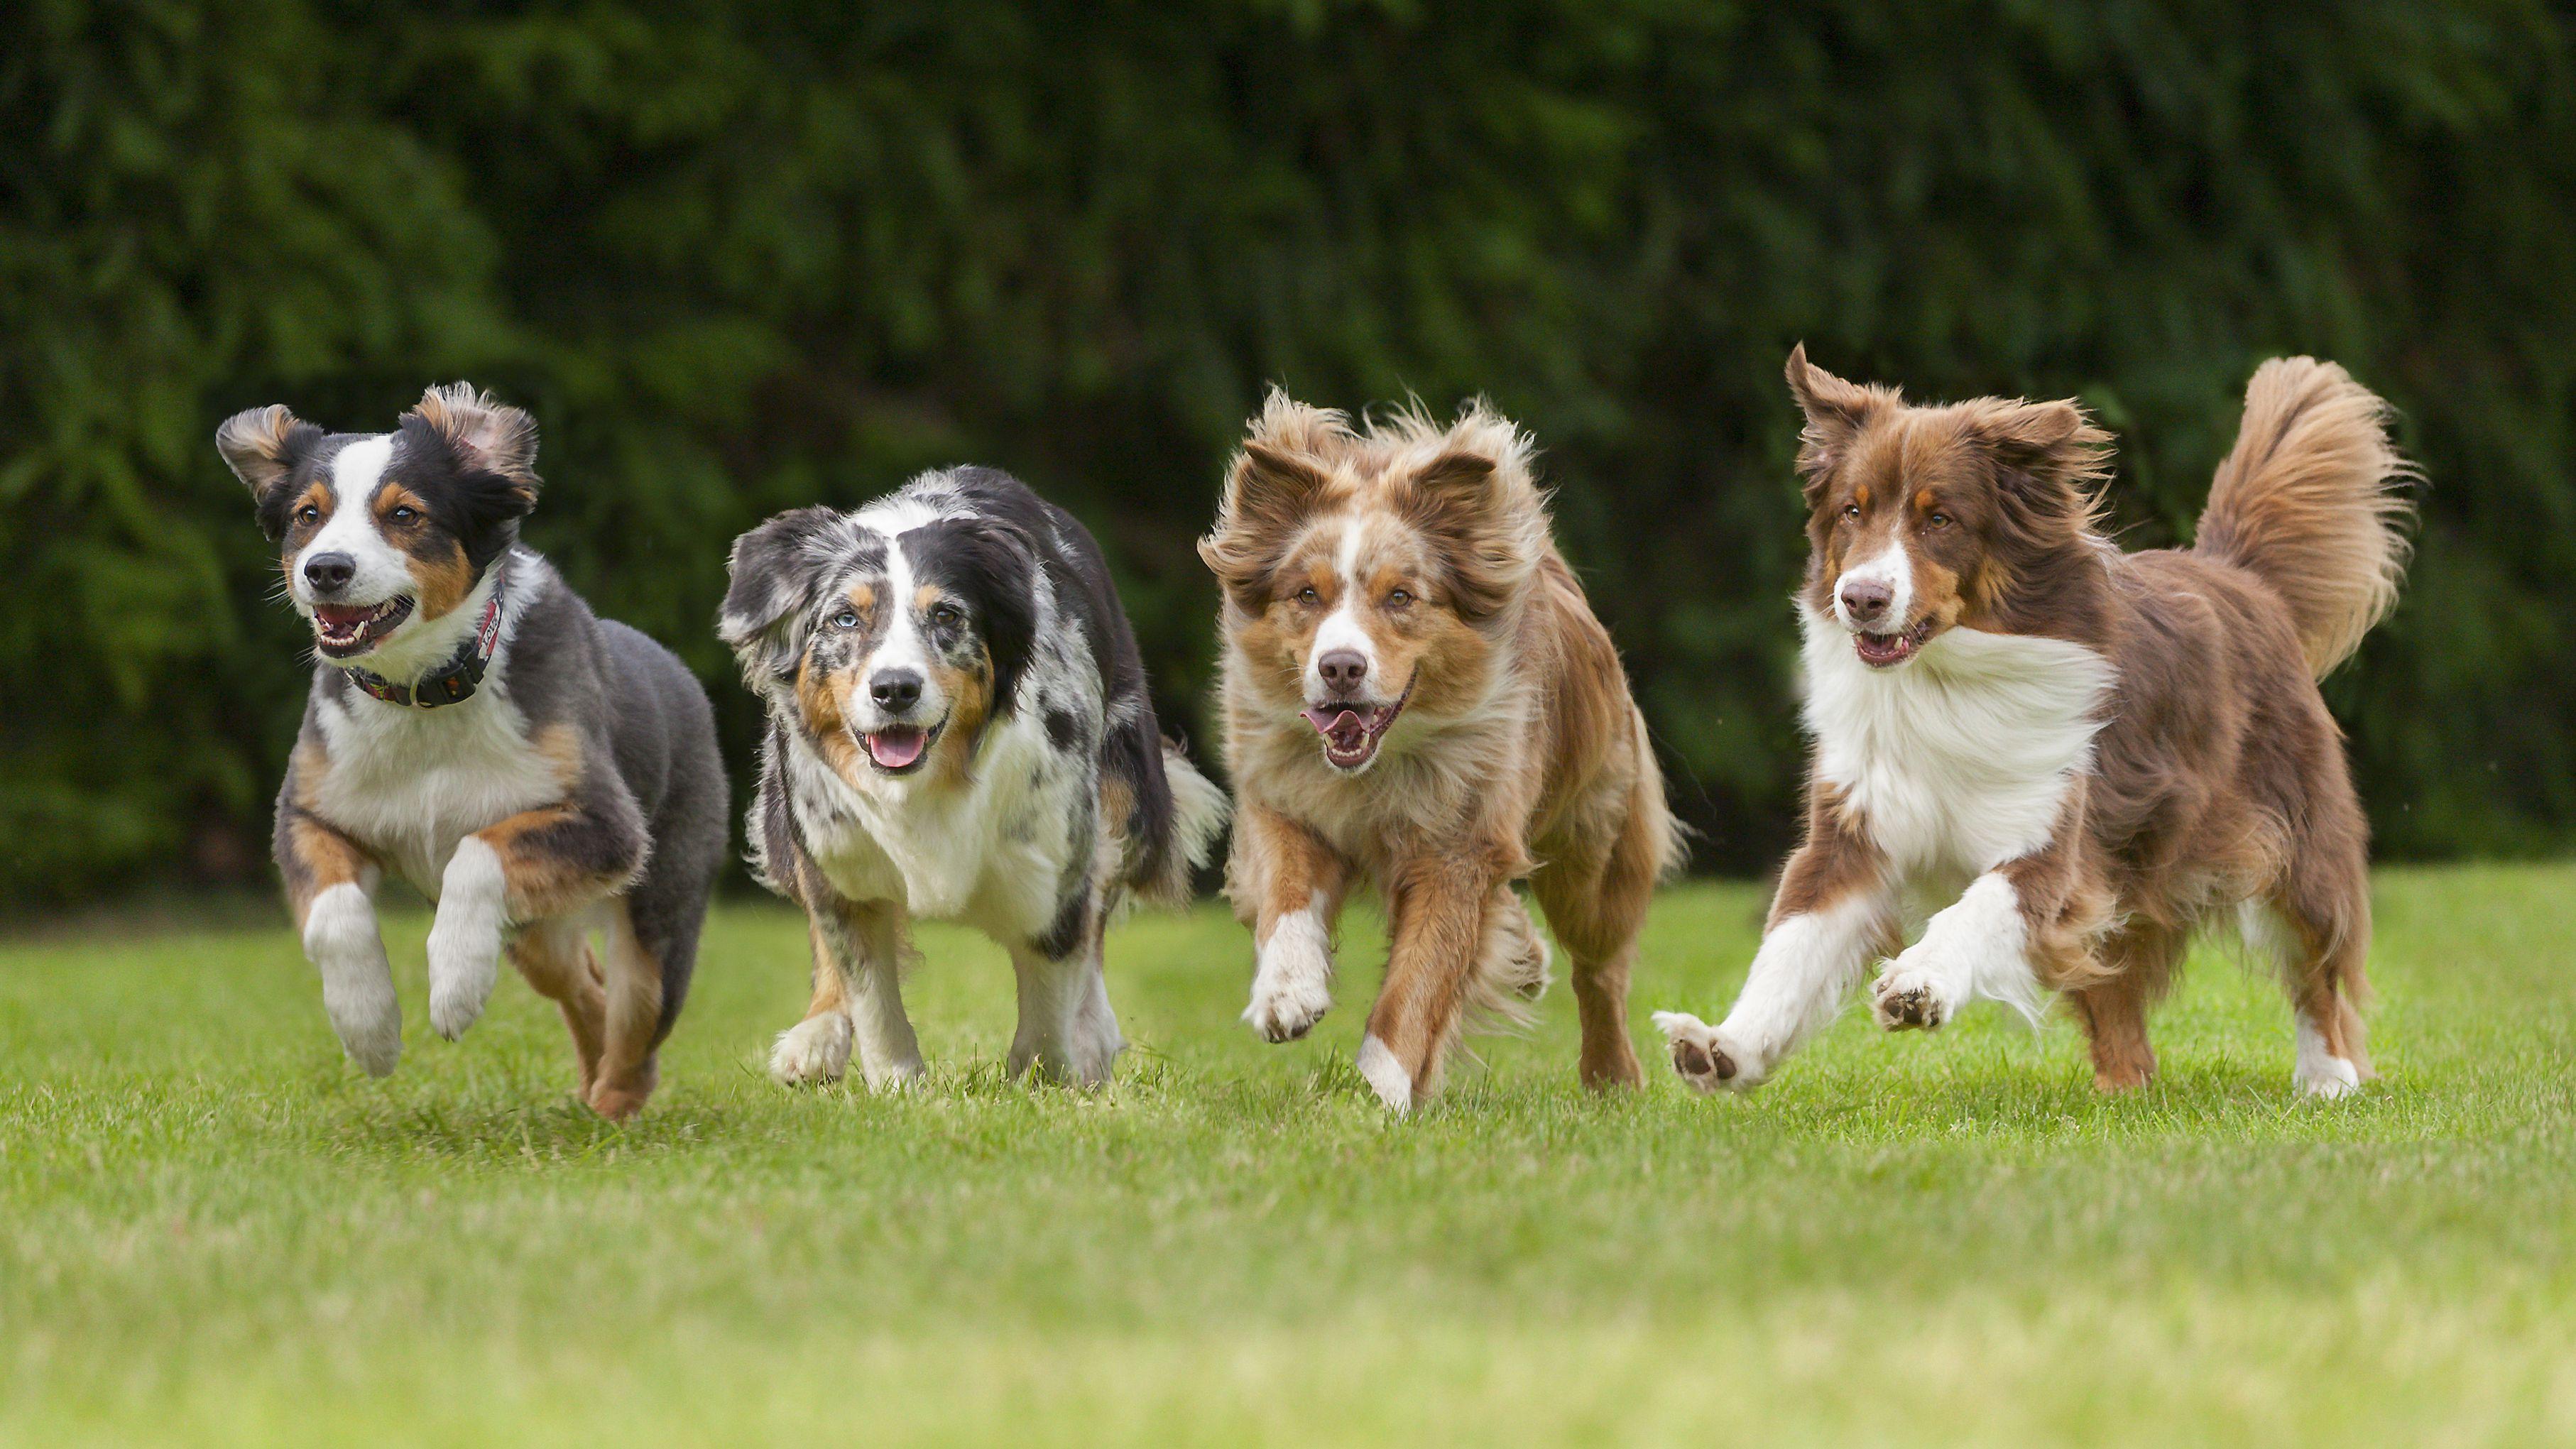 4 running dogs in a row 5c6461ebc9e77c ad